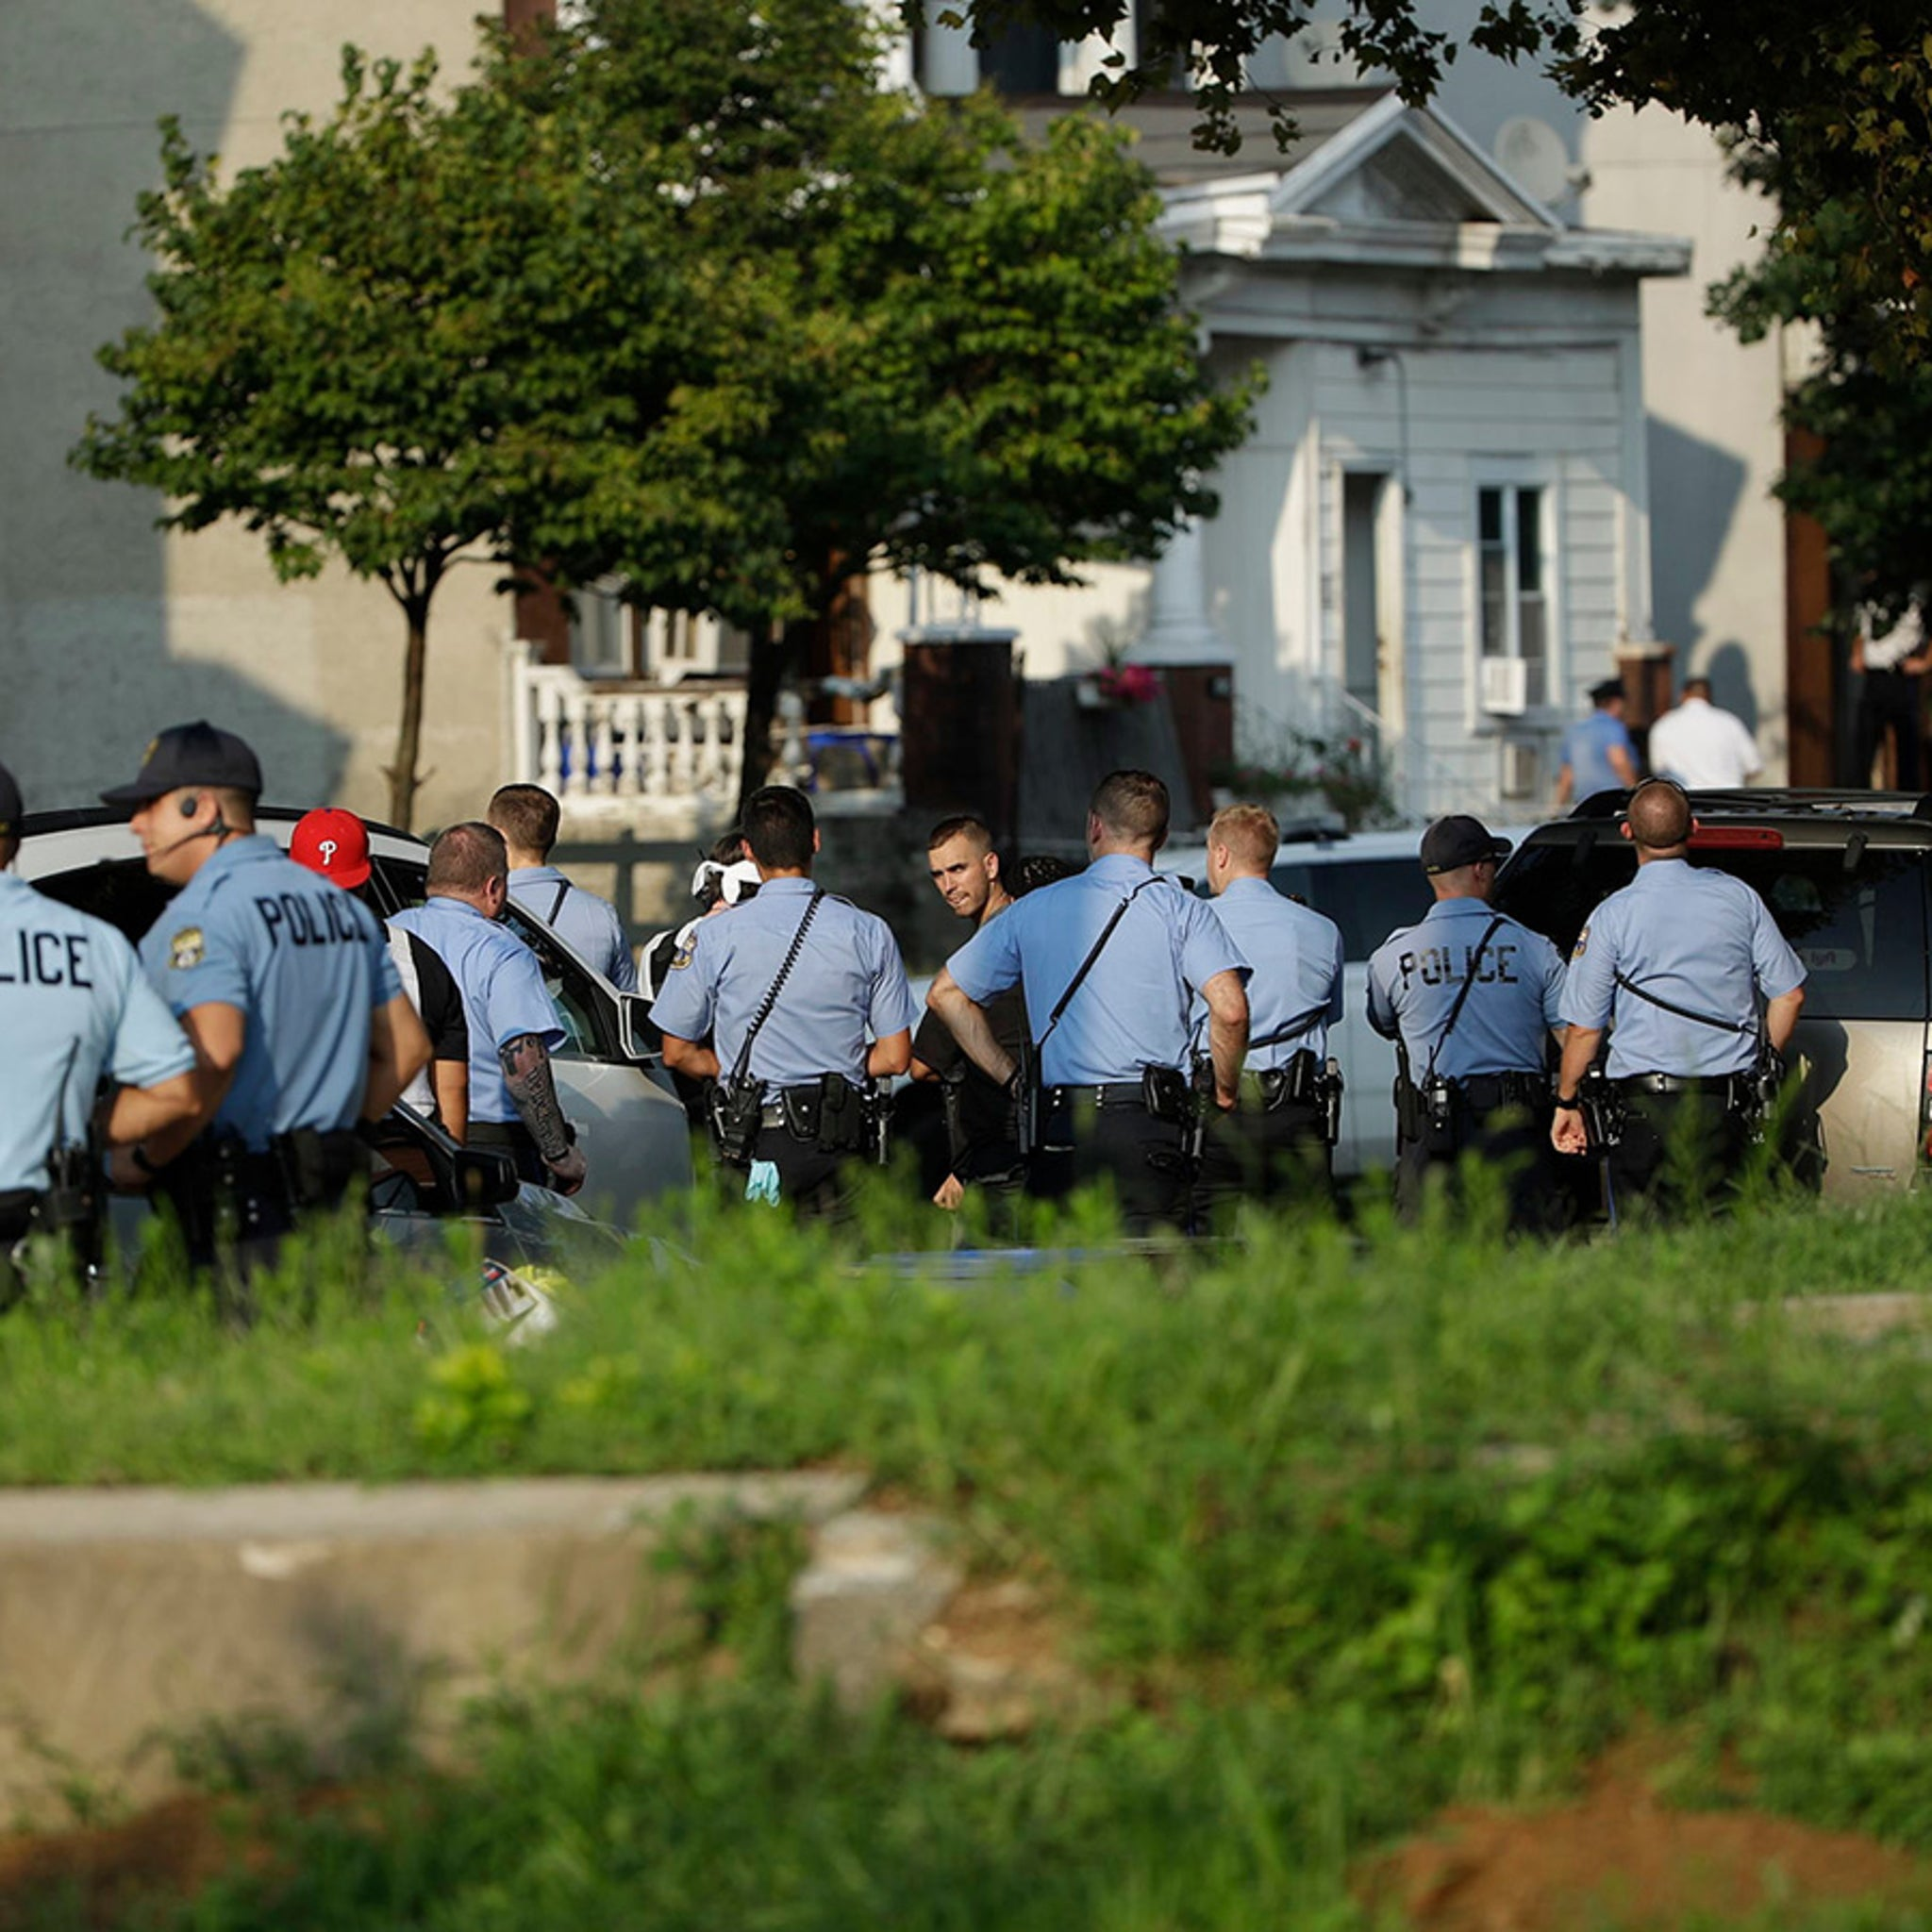 Multiple Police Officers Shot in Philadelphia, Suspect Barricaded